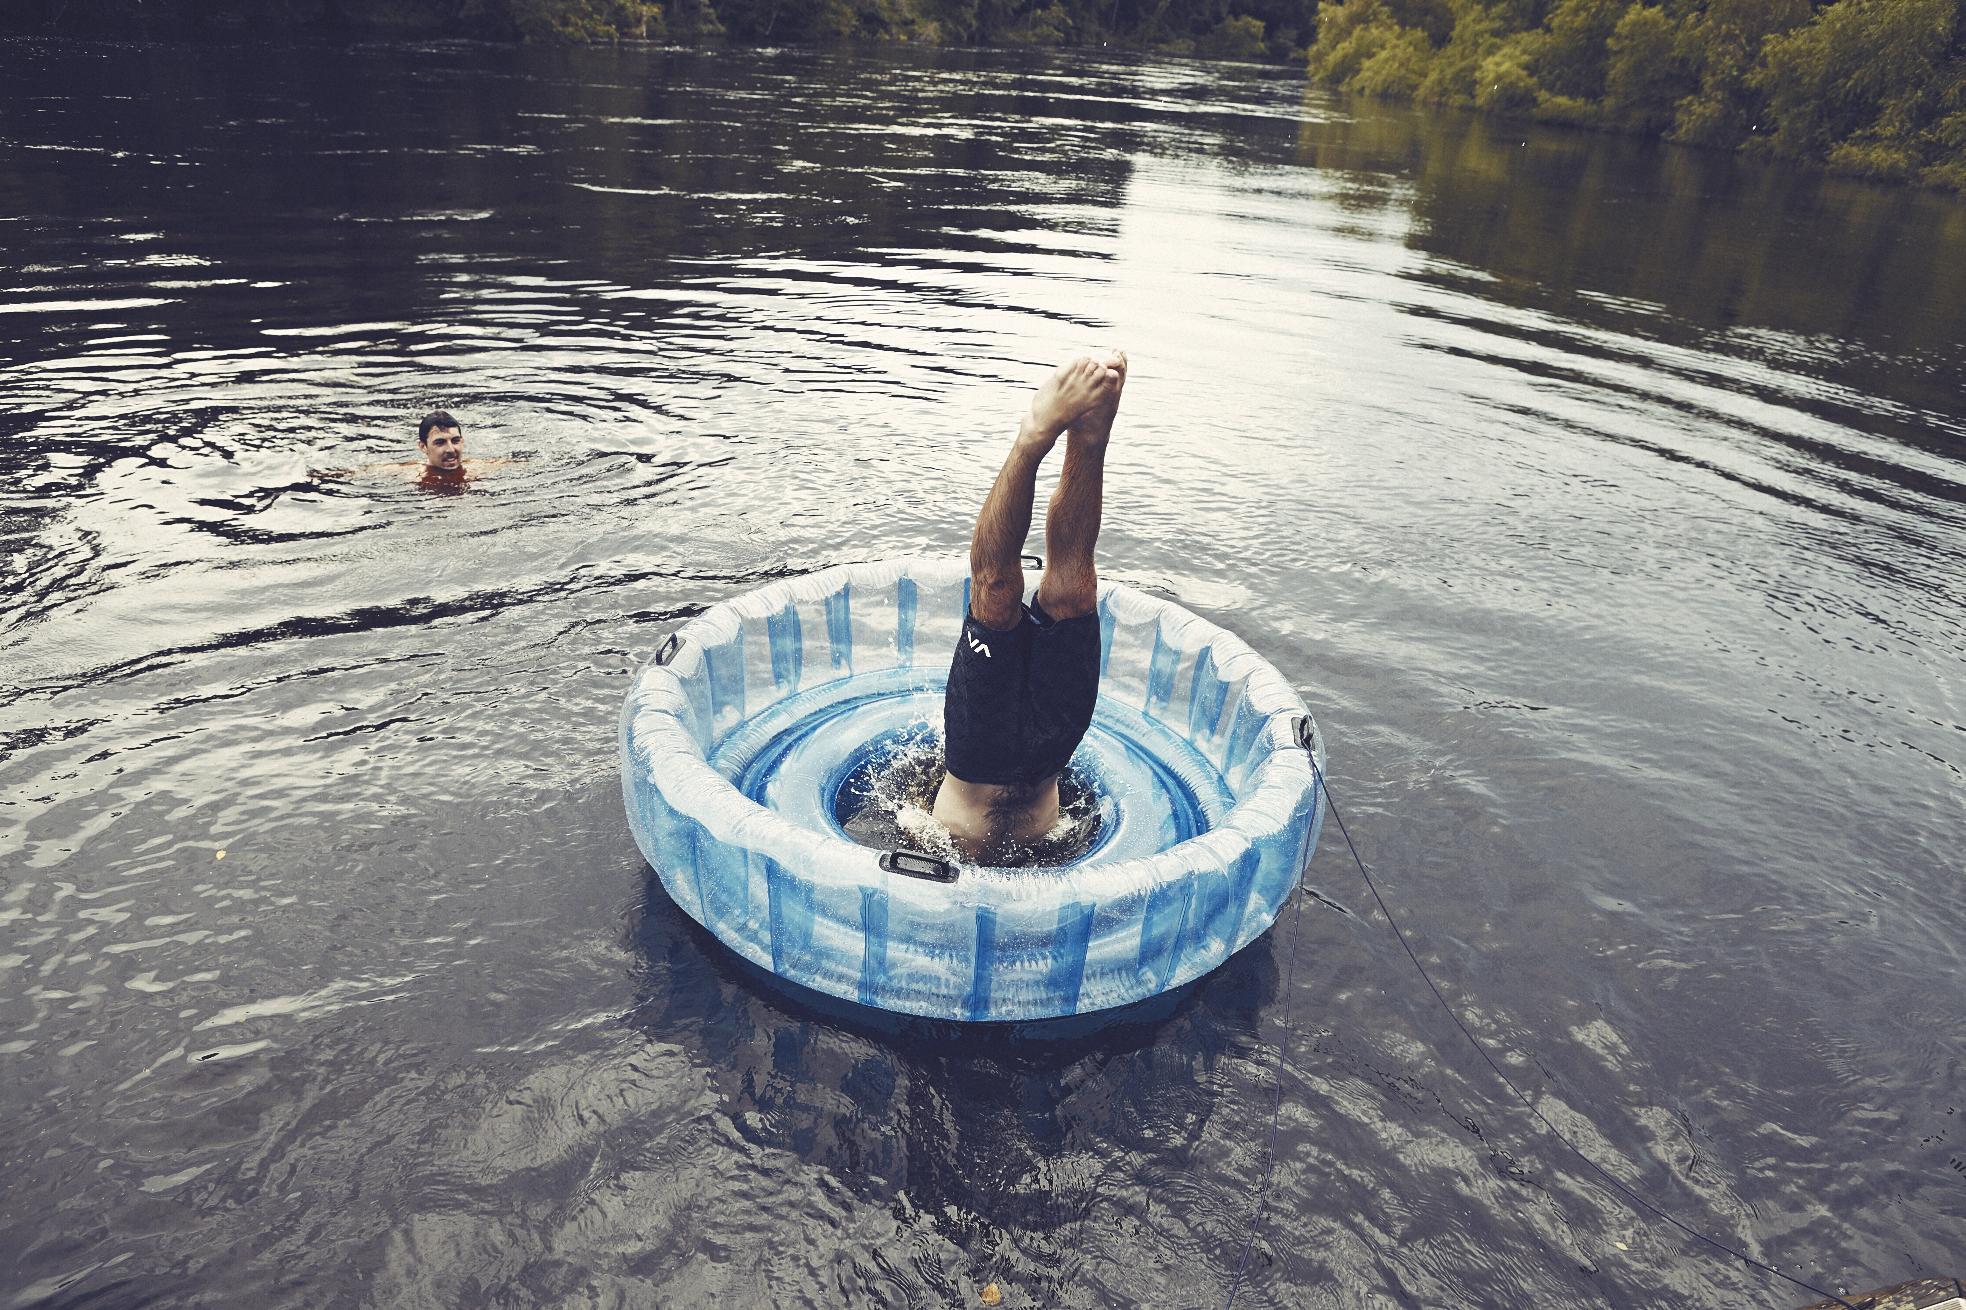 edisto_river_float_104.jpg